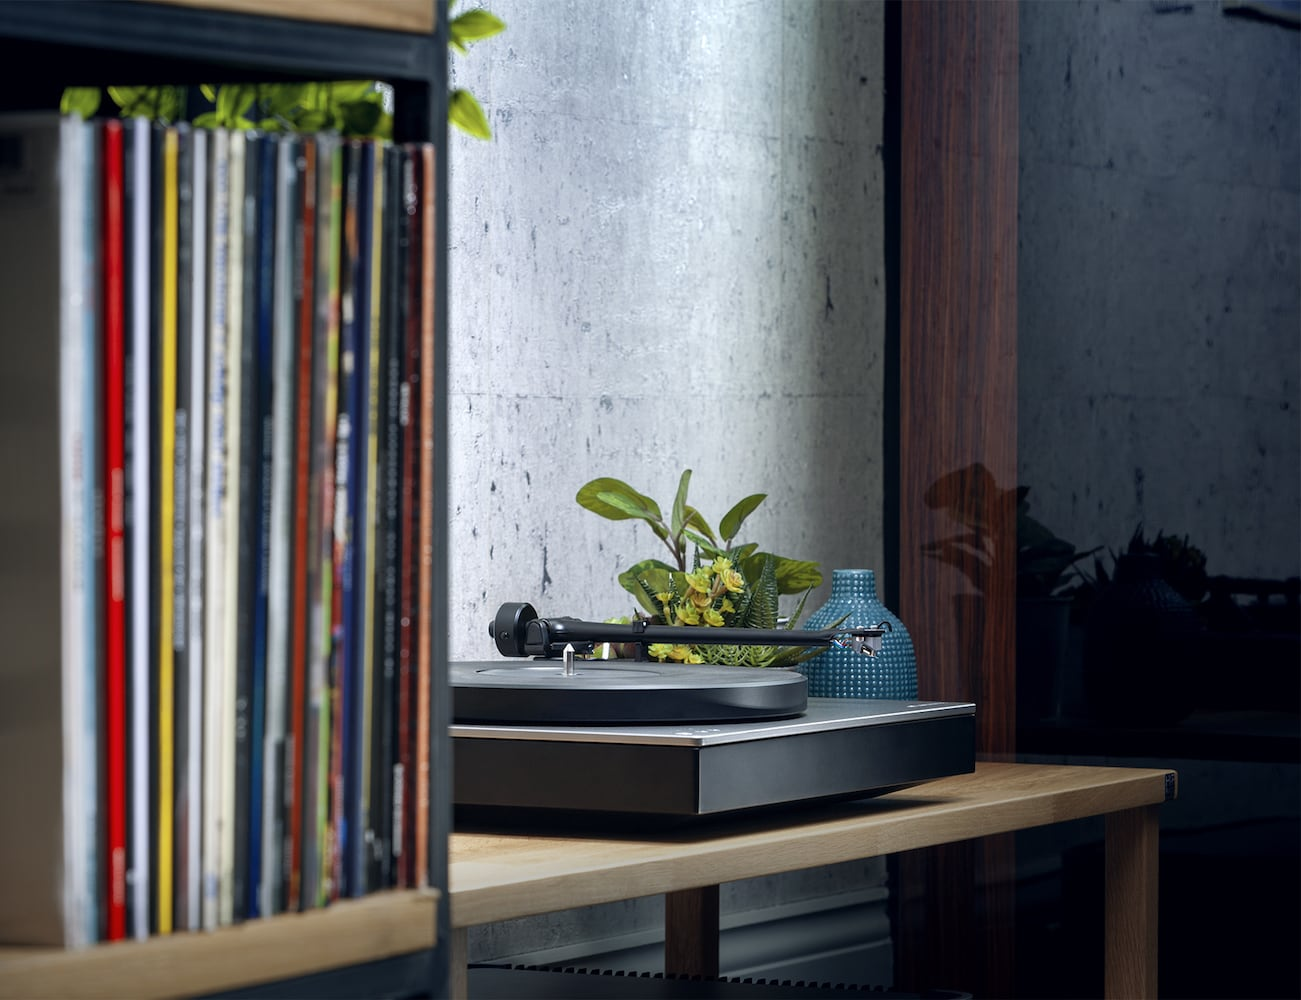 Cambridge Audio Alva TT Bluetooth Direct Drive Turntable offers a completely wireless vinyl experience